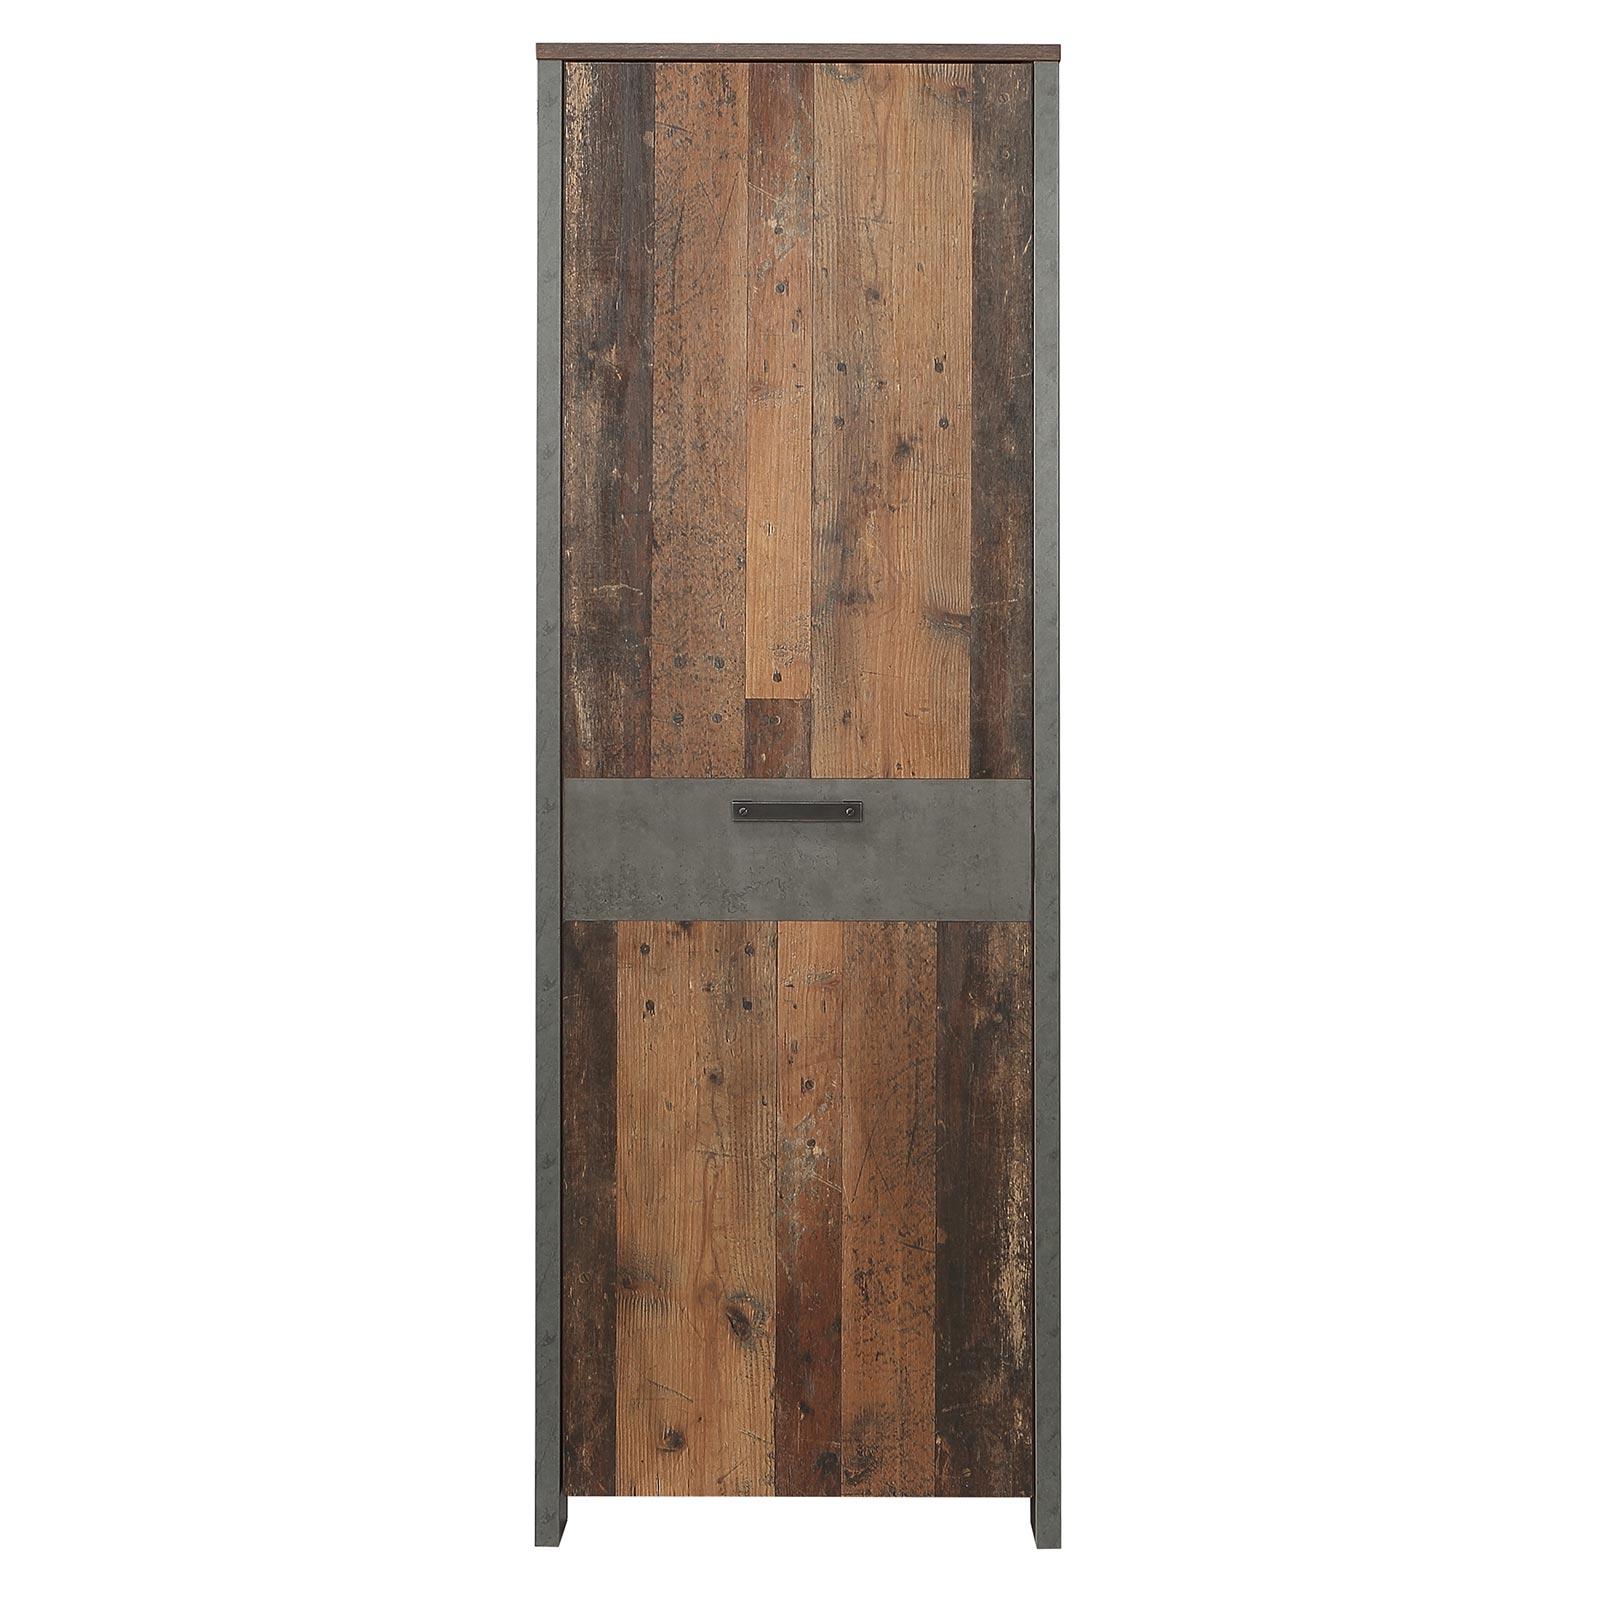 Garderobenschrank Old Wood Vintage Betonoptik